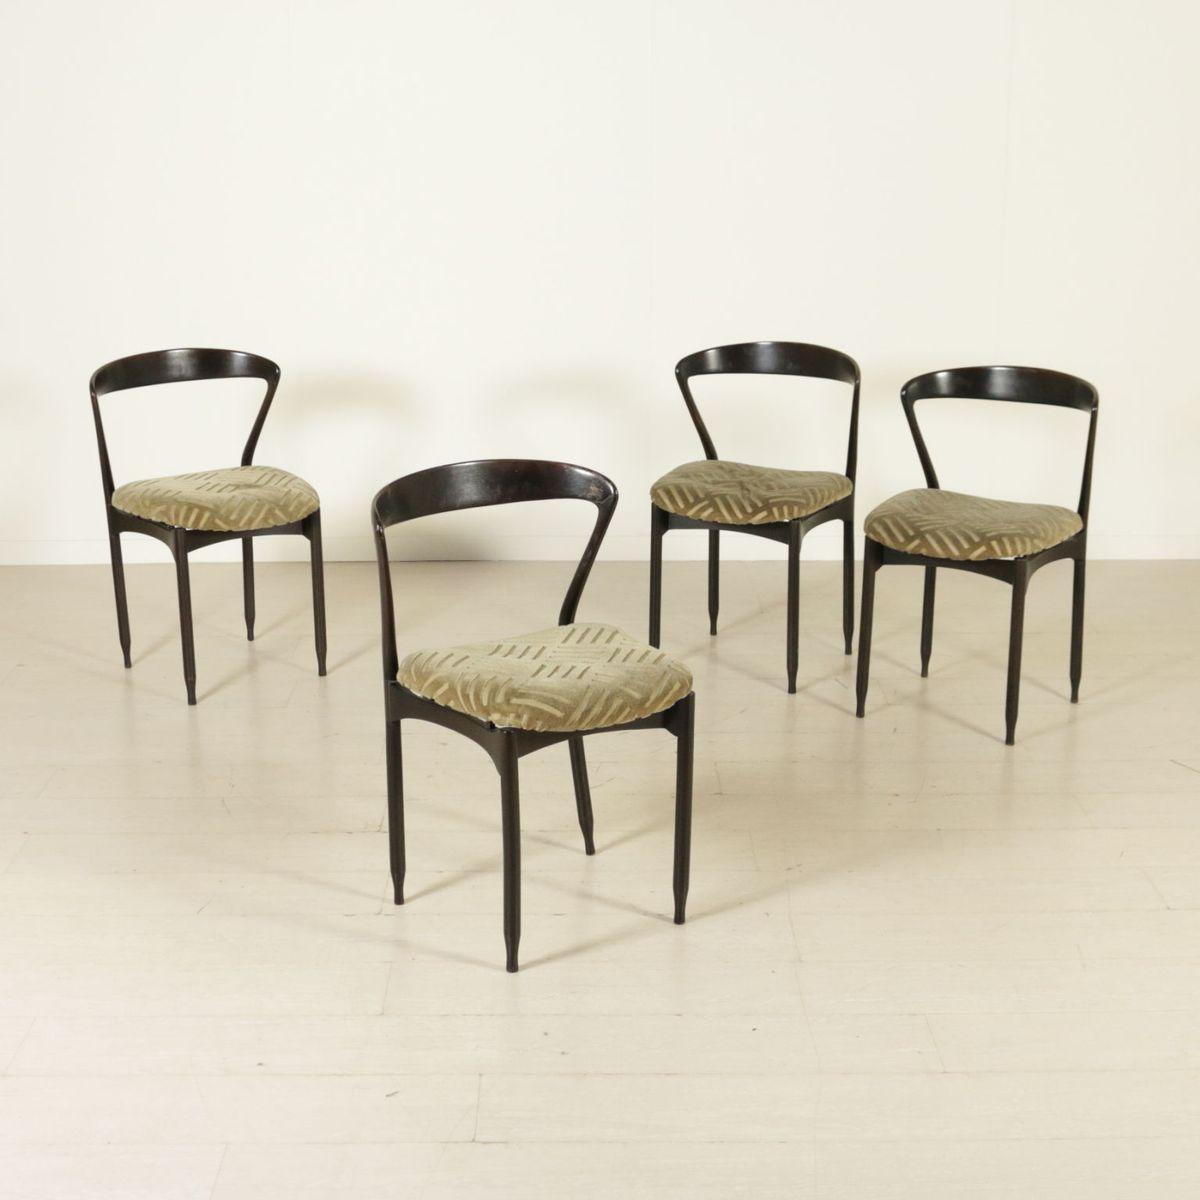 ebonisierte italienische st hle aus gebeiztem holz 1960er. Black Bedroom Furniture Sets. Home Design Ideas